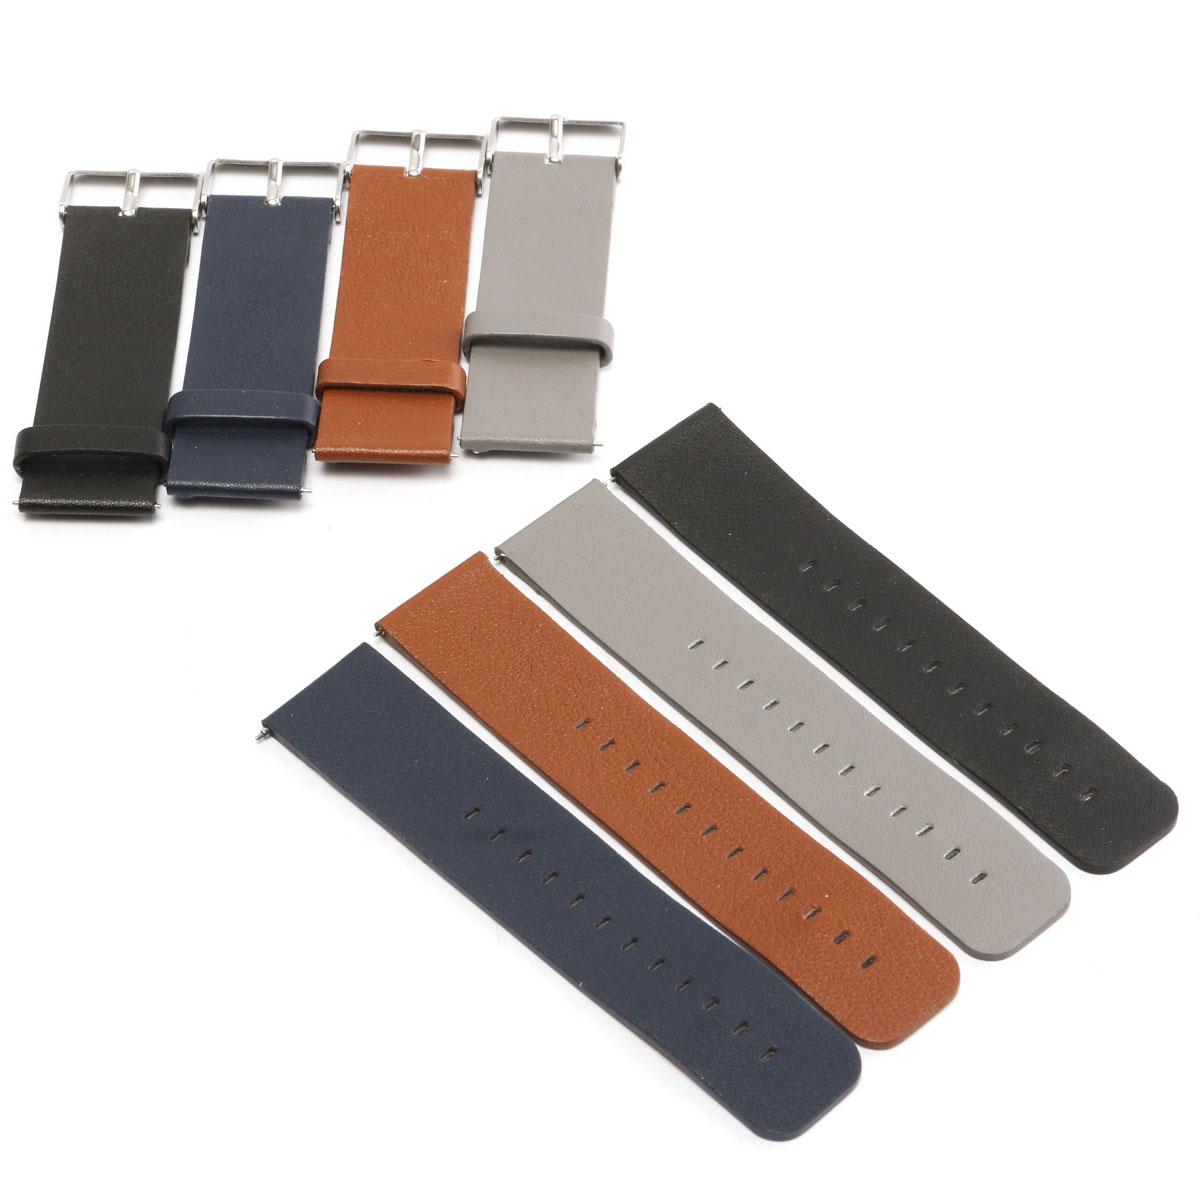 Fitbit Blaze Strap Genuine PU Leather Loop Strap For Fitbit Blaze Tracker Smart Fitness Watch With Magnet Lock Strap<br><br>Aliexpress